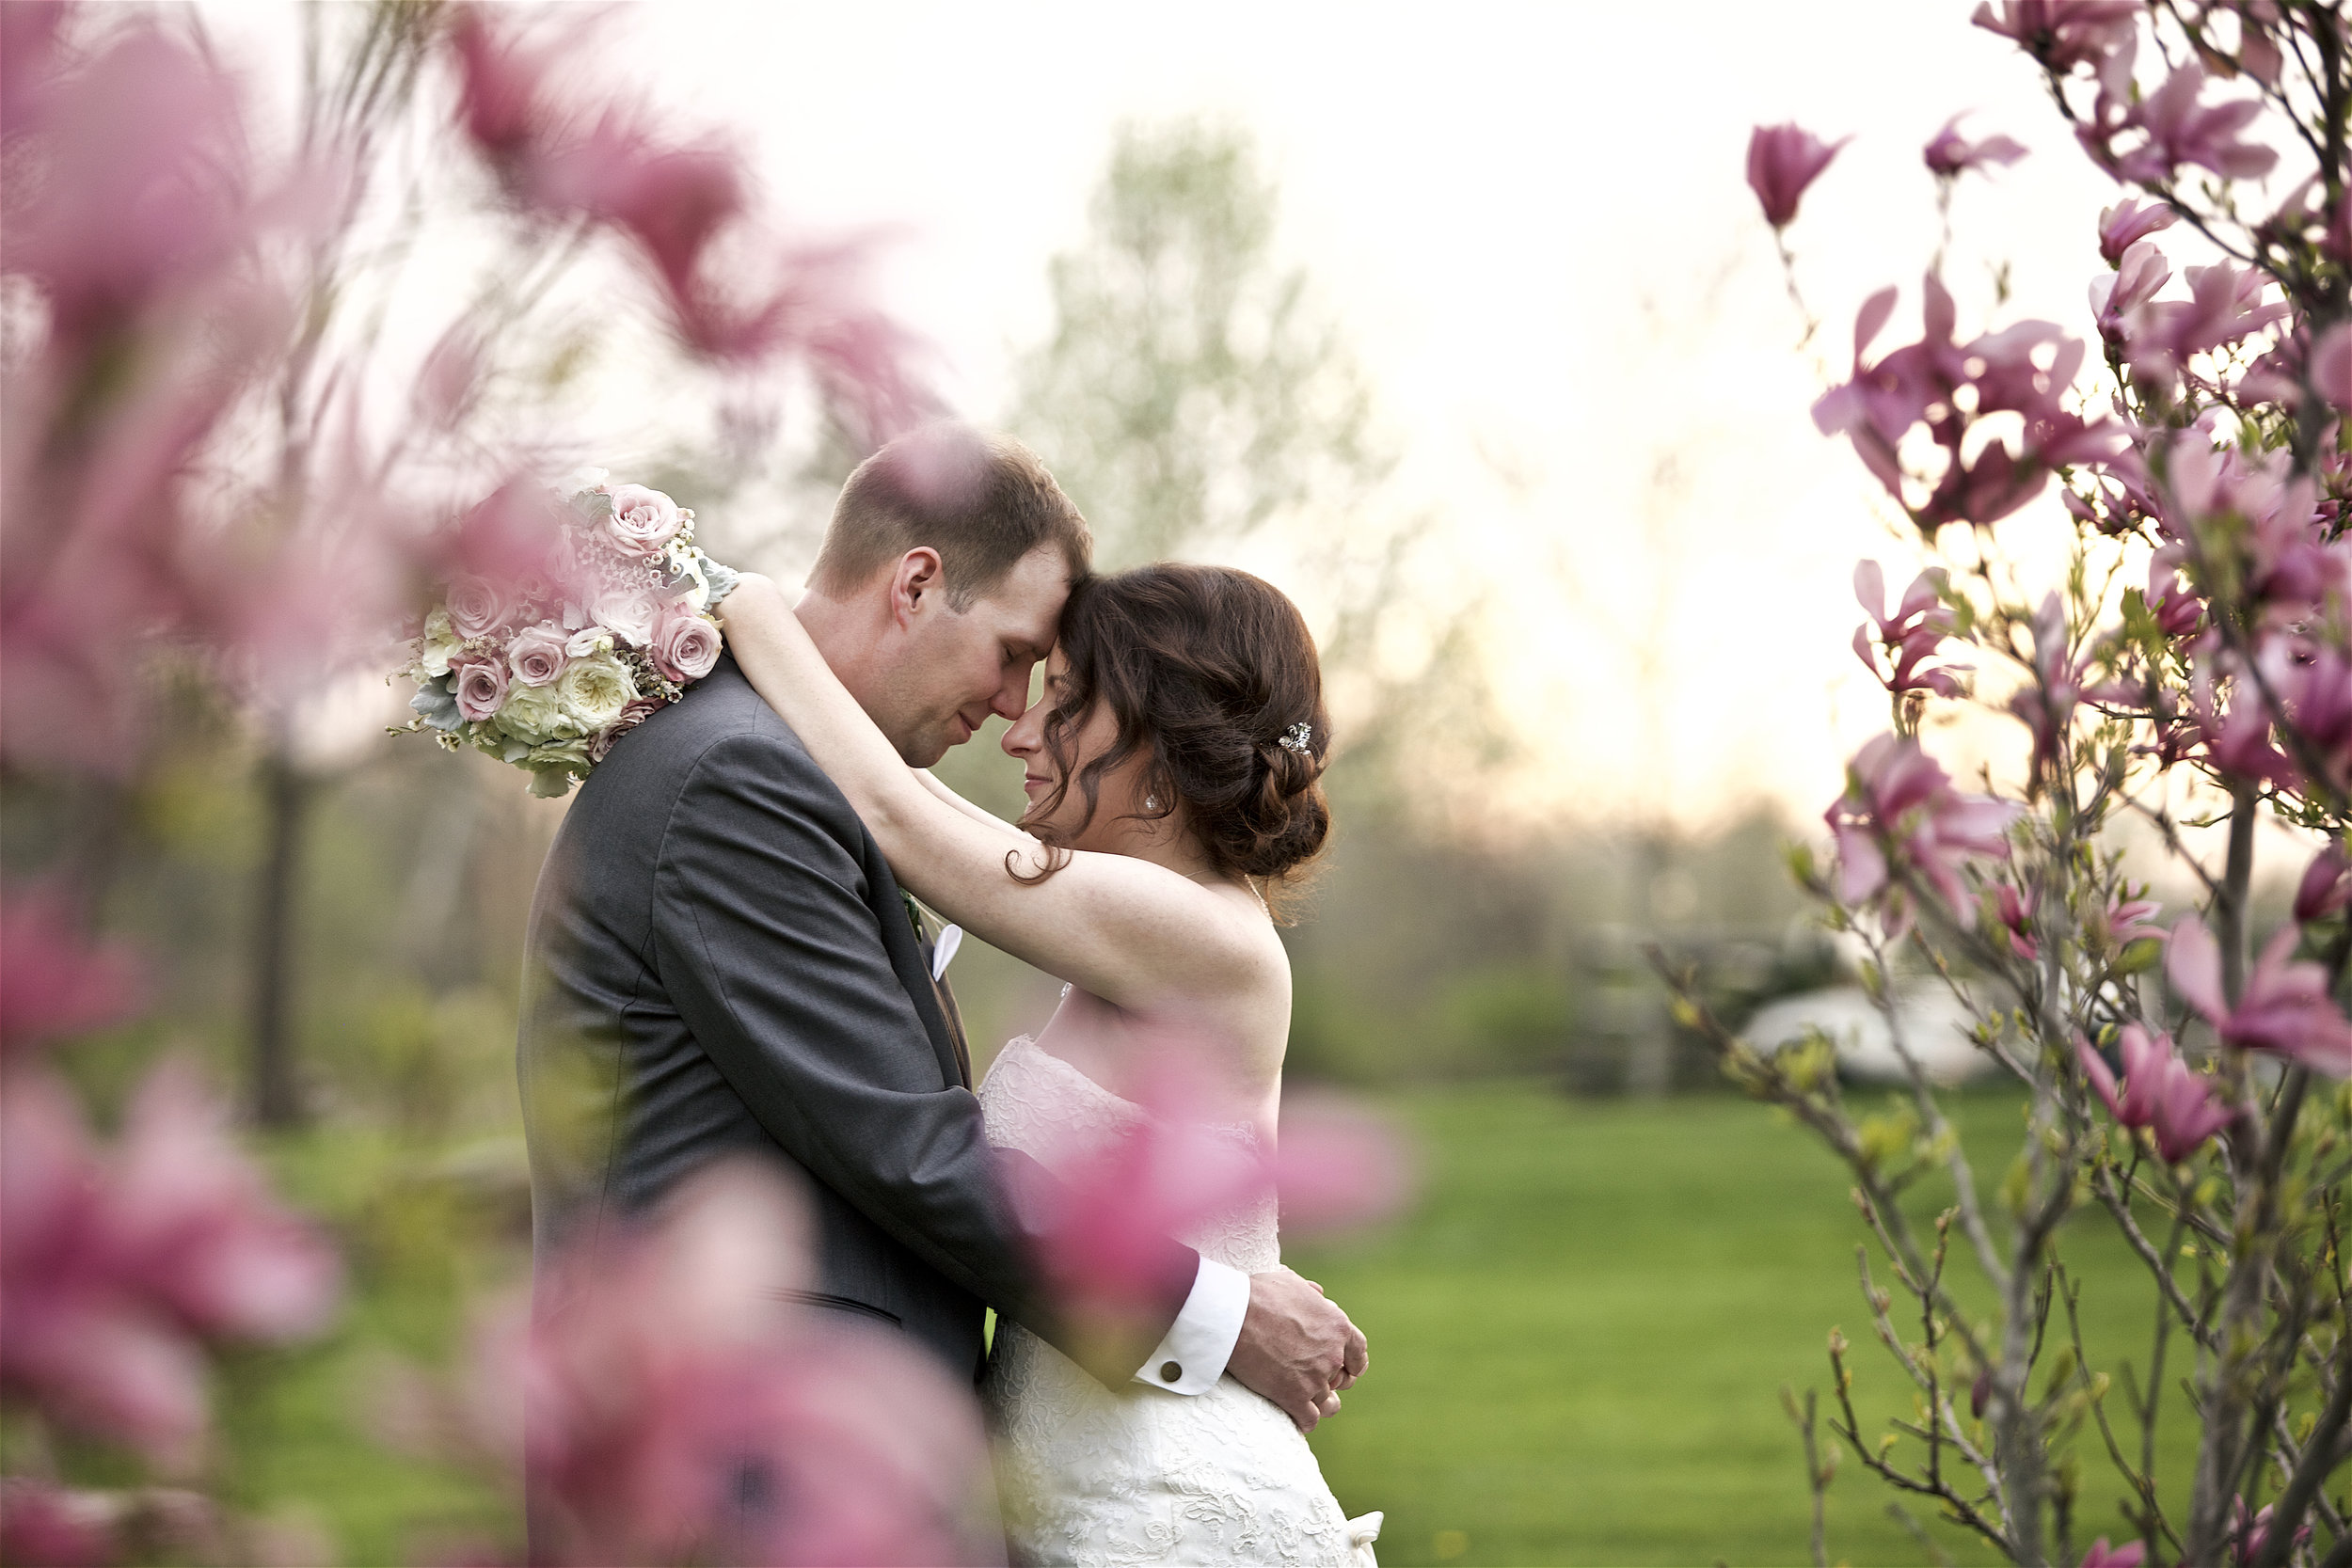 Lippincott manor wedding, wallkill ny wedding, photography, photos y.jpg